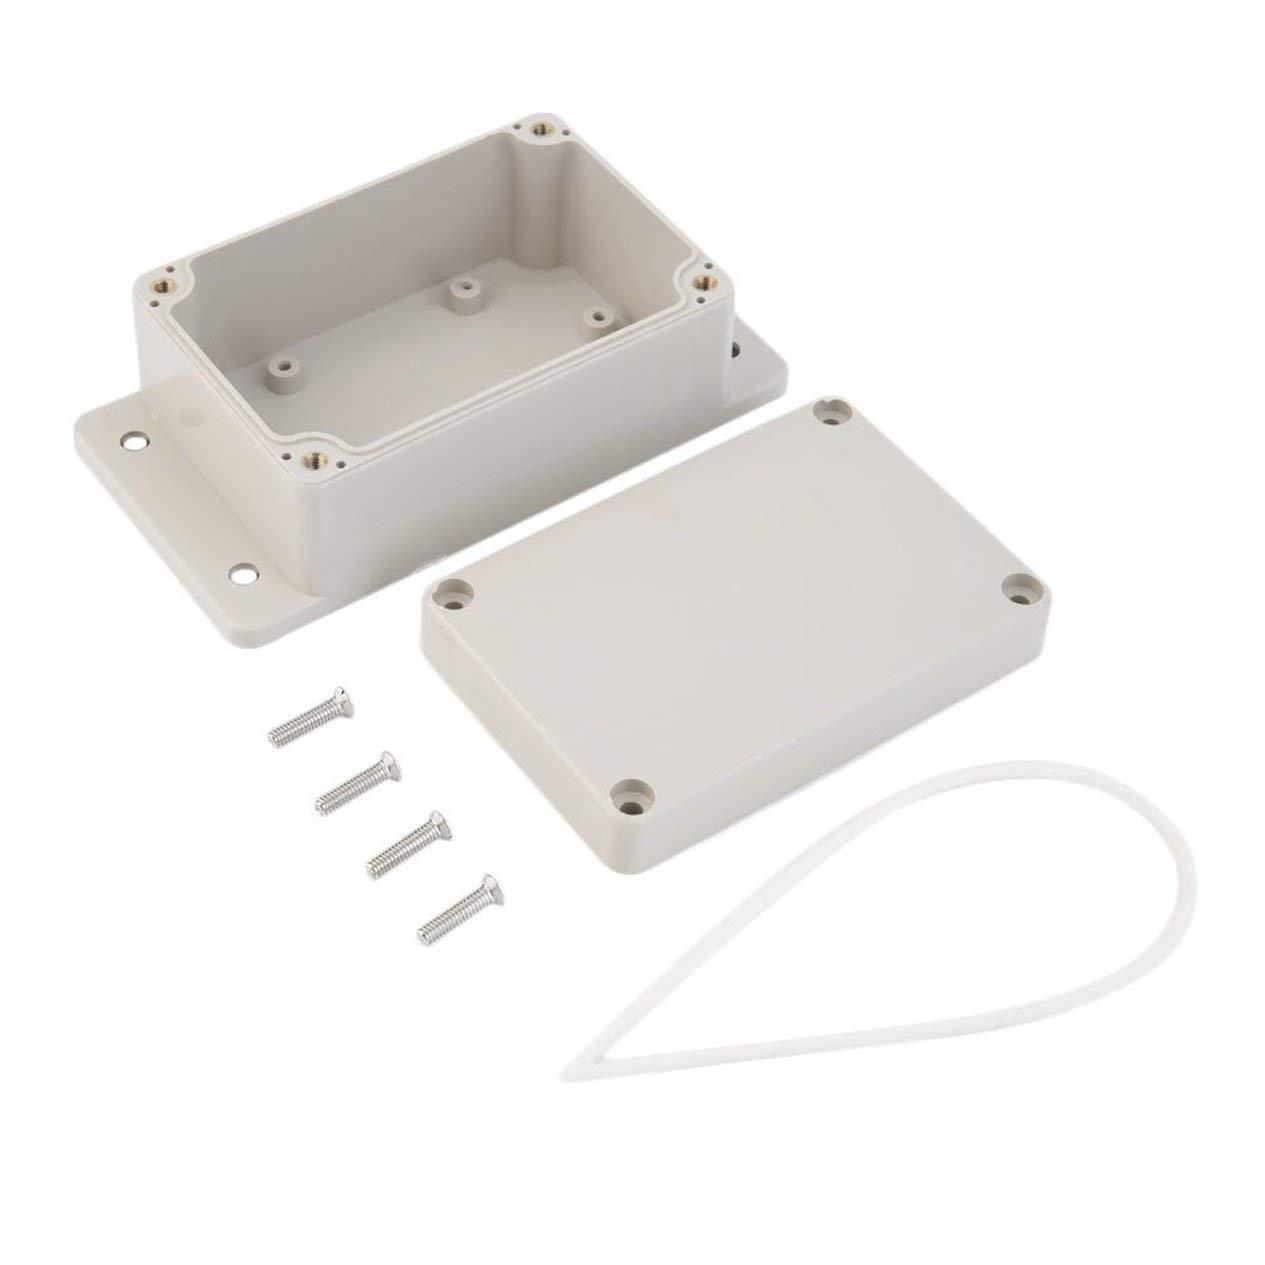 EdBerk74 /Étanche 100 x 68 x 50mm Plastique Projet /électronique Bo/îtier Bo/îtier Bo/îtier DIY Bo/îtier Instrument